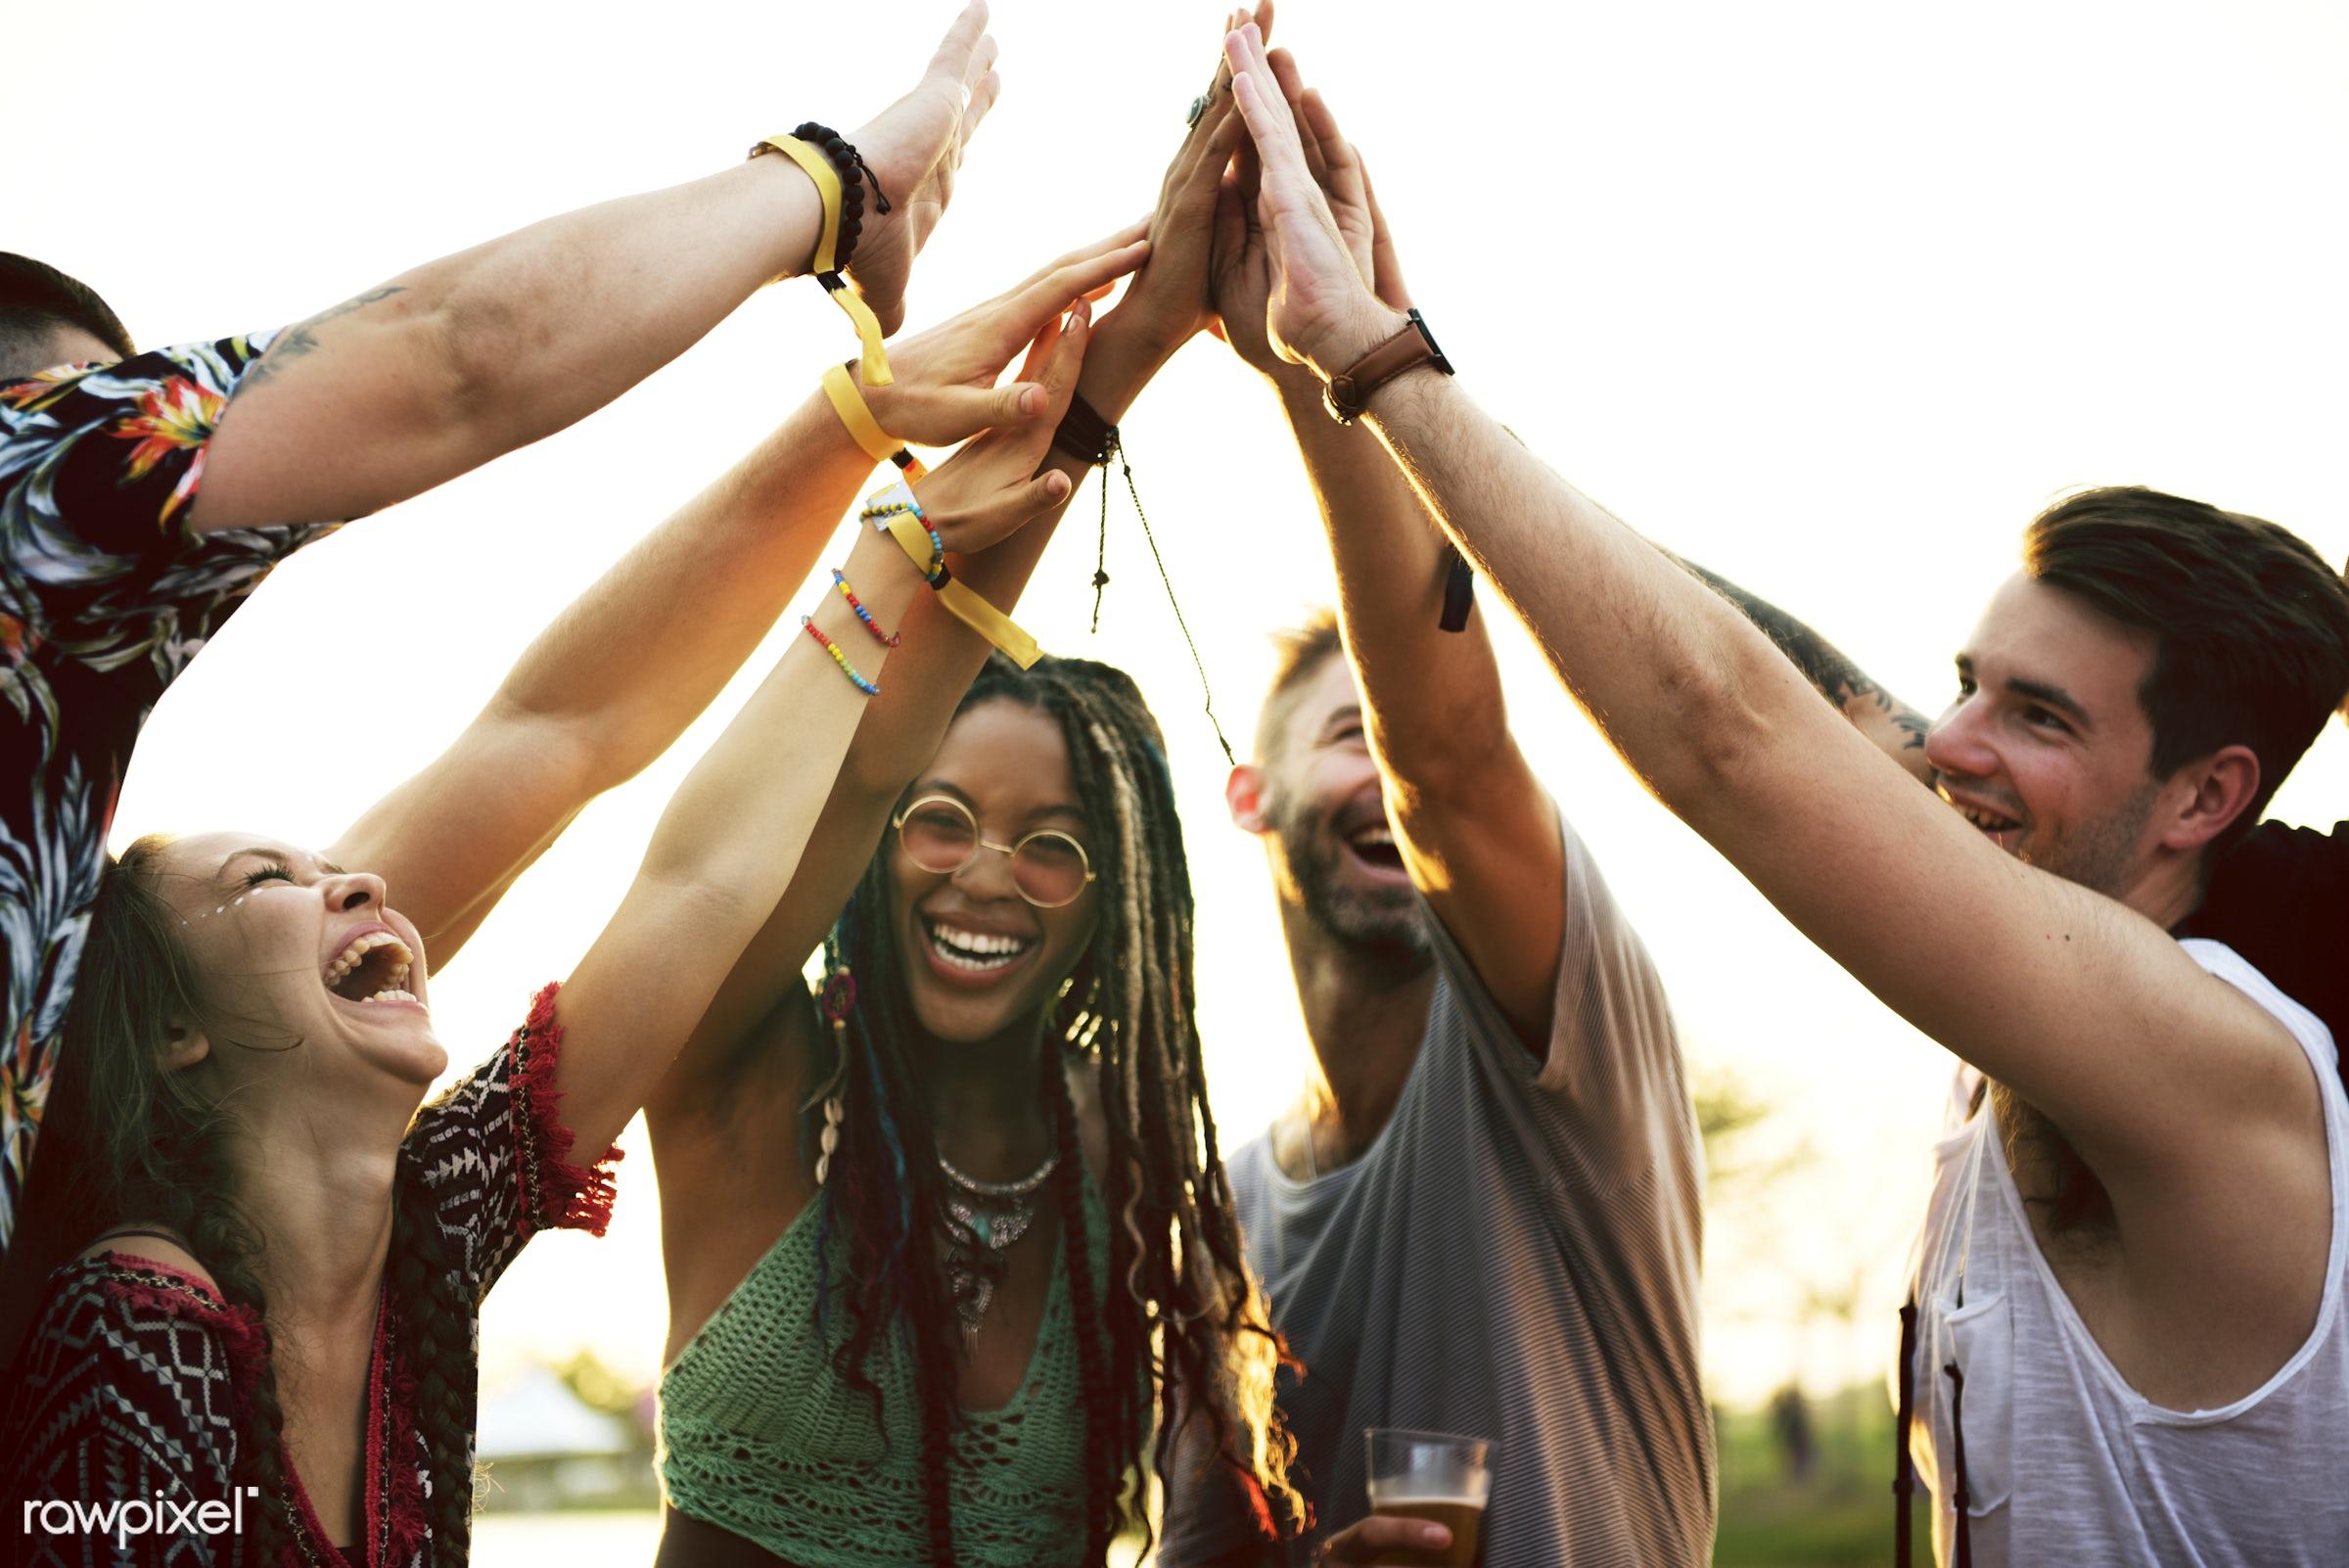 activity, adults, best friends, bonding, buddy, carefree, concert, crowd, culture, diversity, enjoying, enjoyment,...